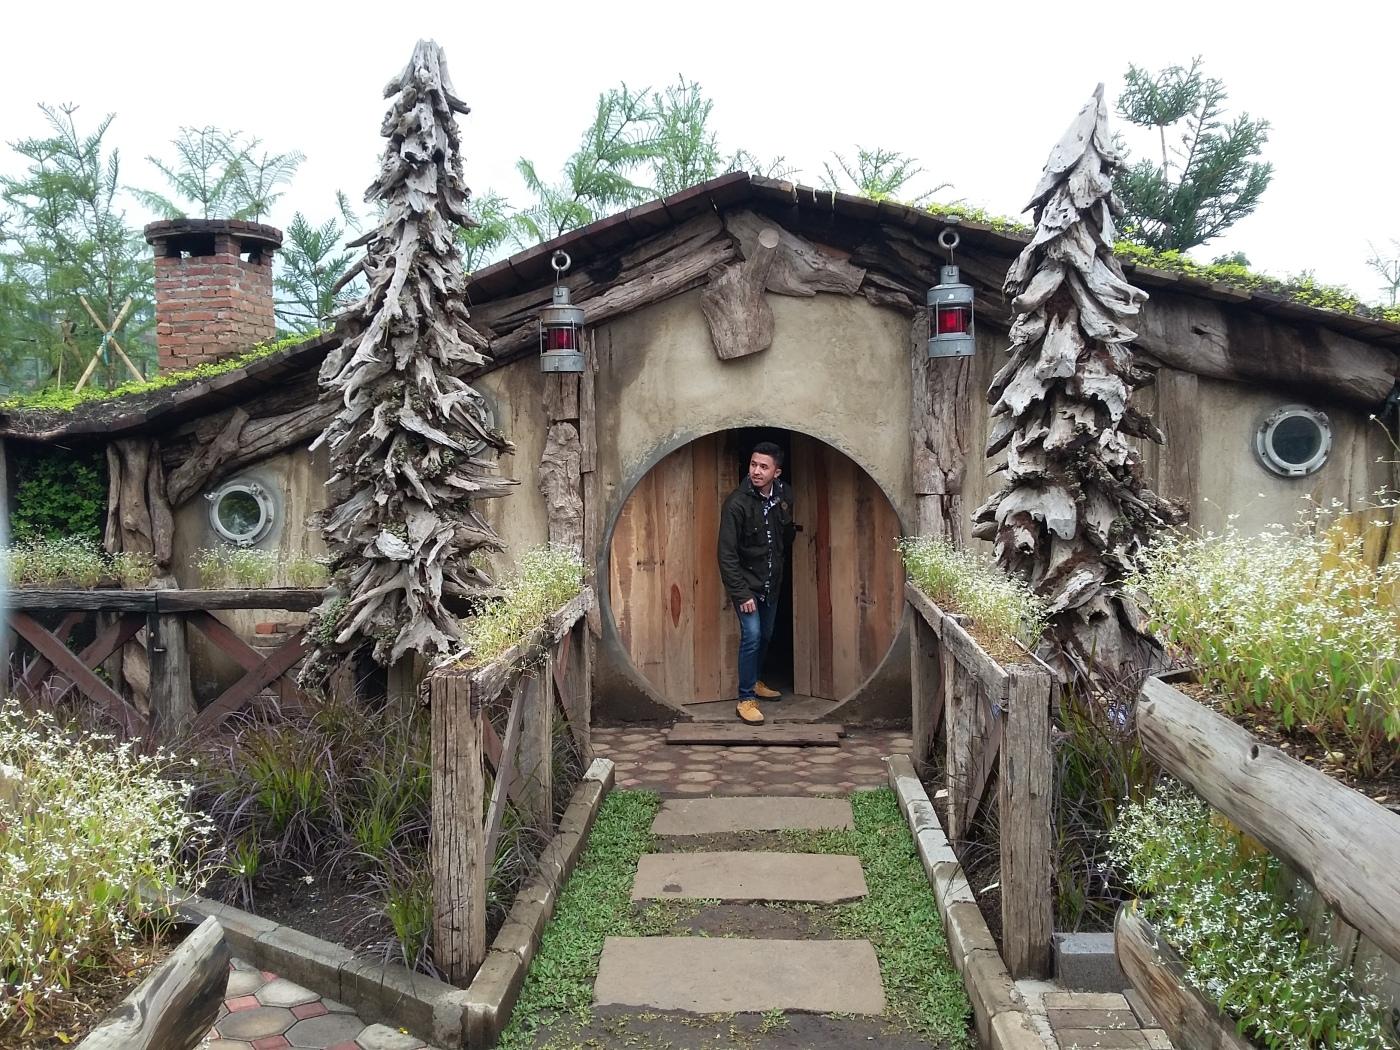 Farmhouse Susu Lembang Bandung (Wisata Alam ala Rumah The